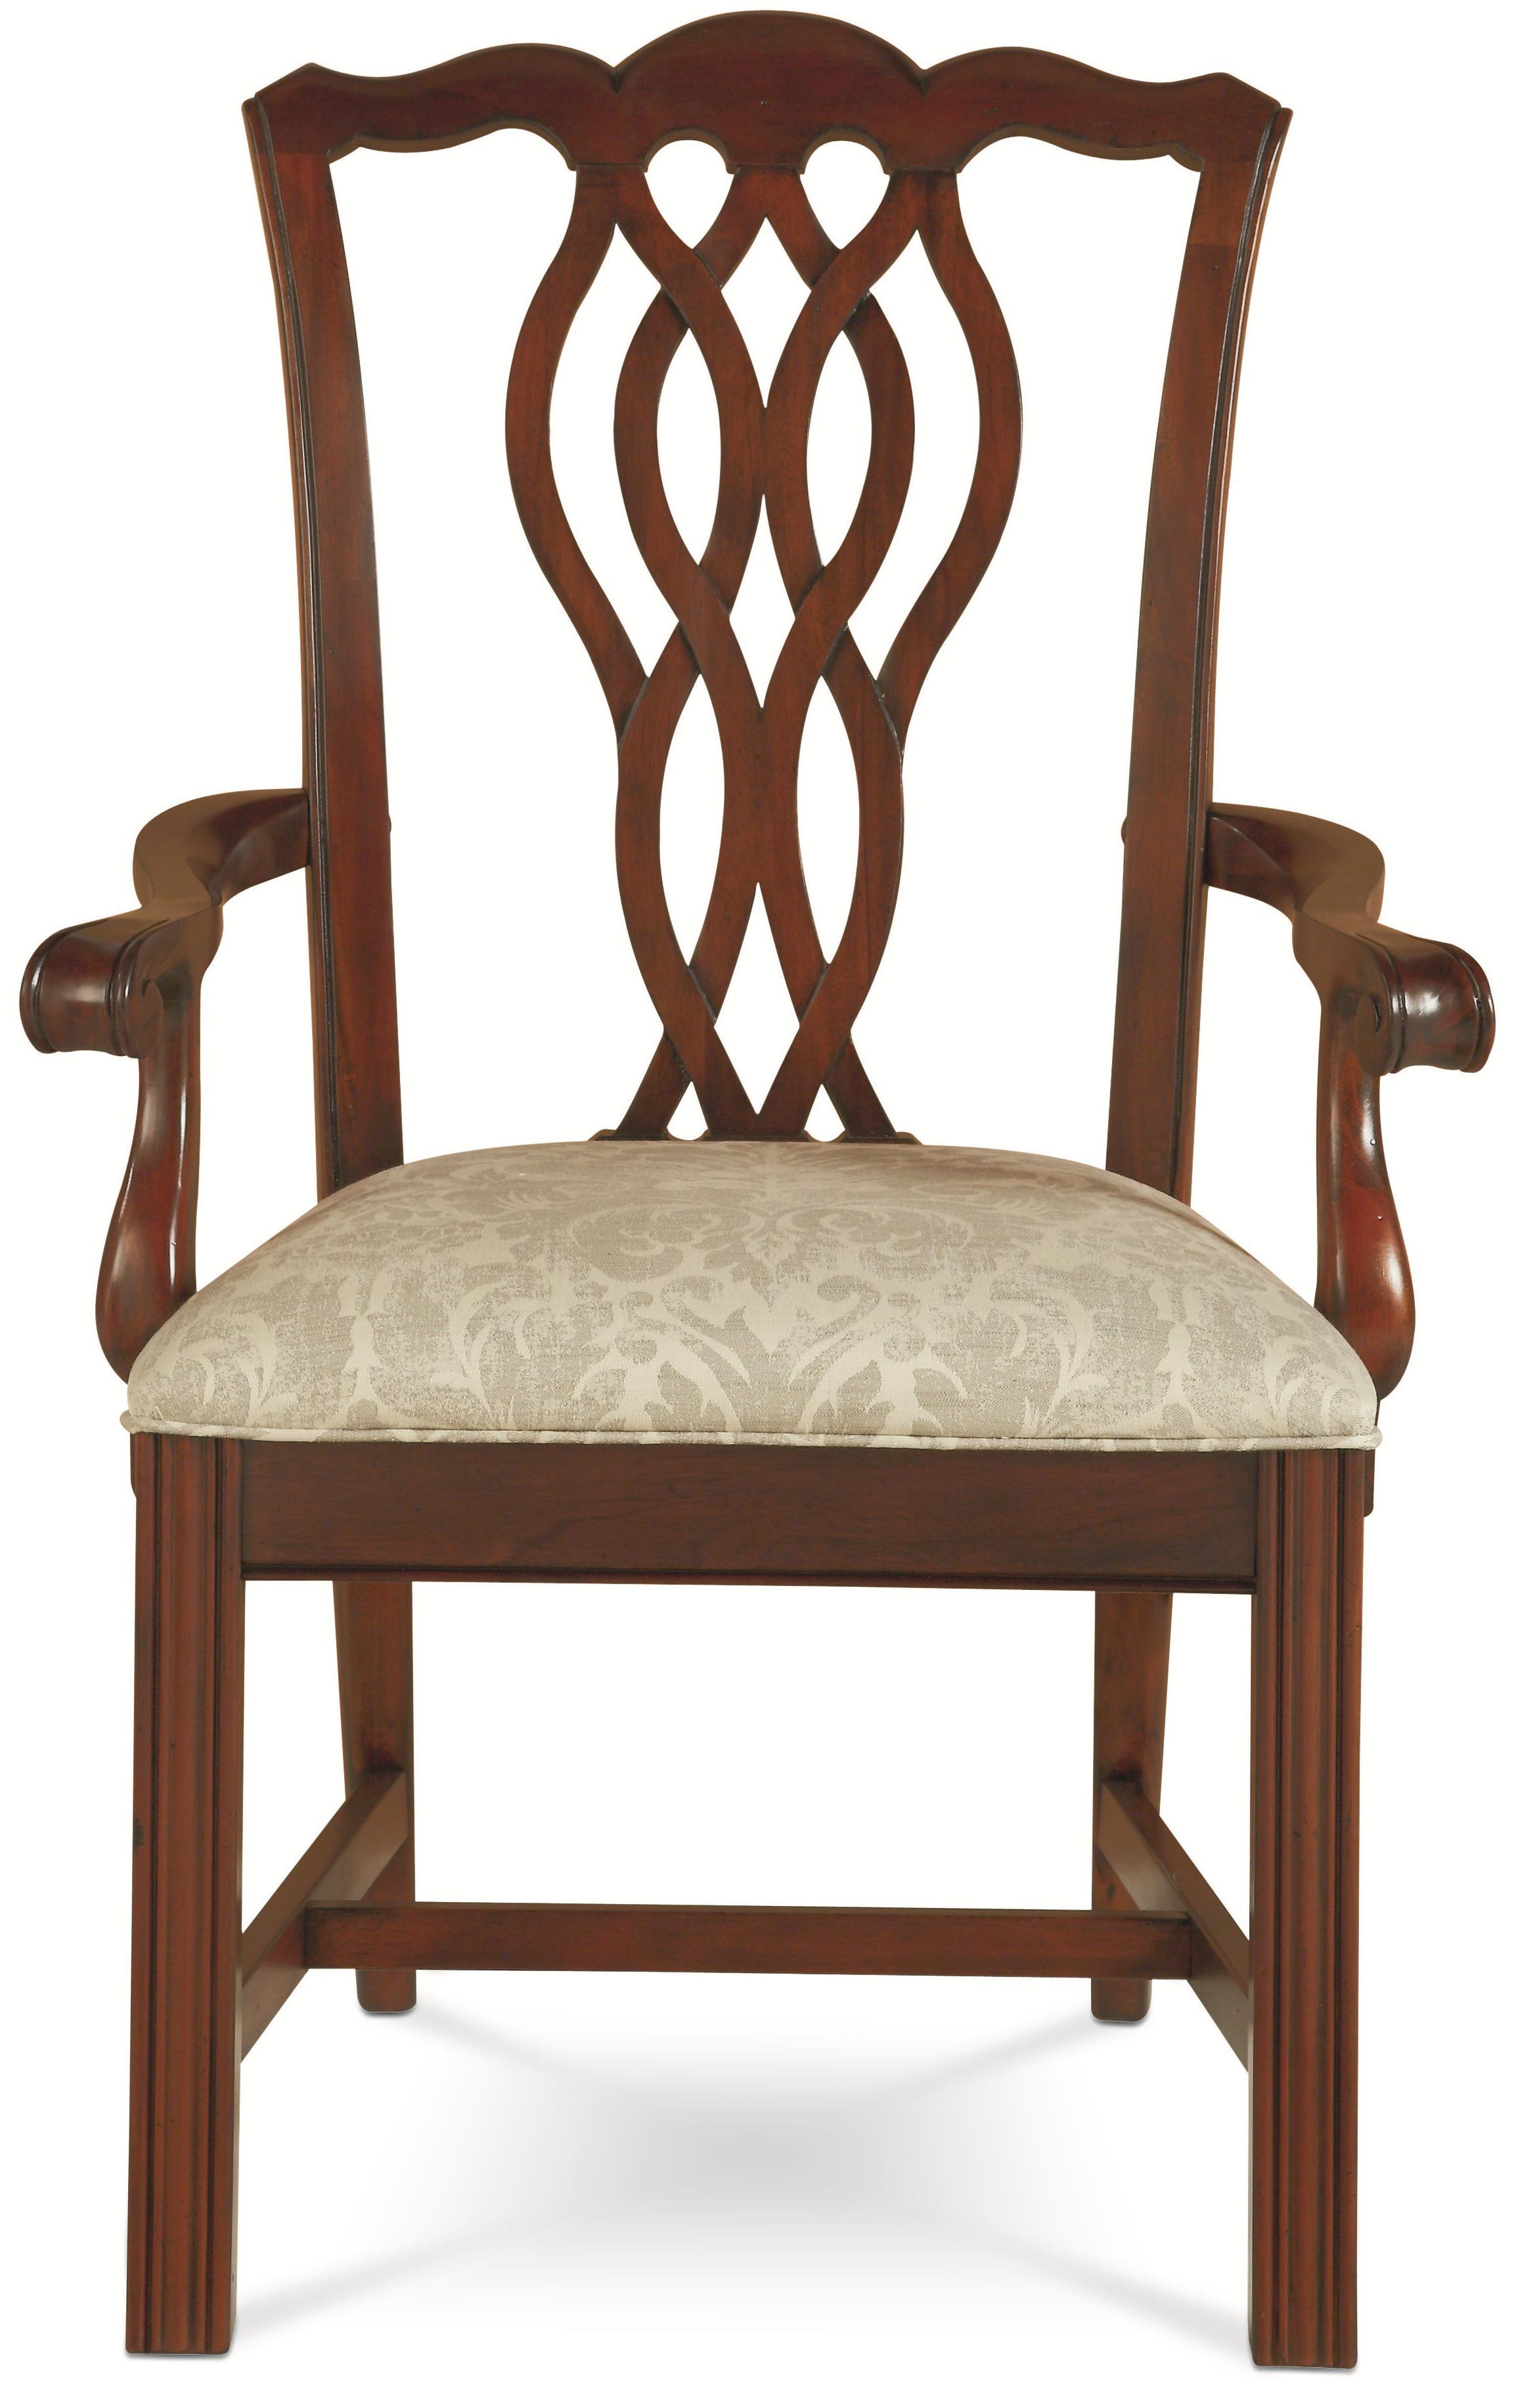 Thomasville® Tate Street Arm Chair - Item Number: 46821-822